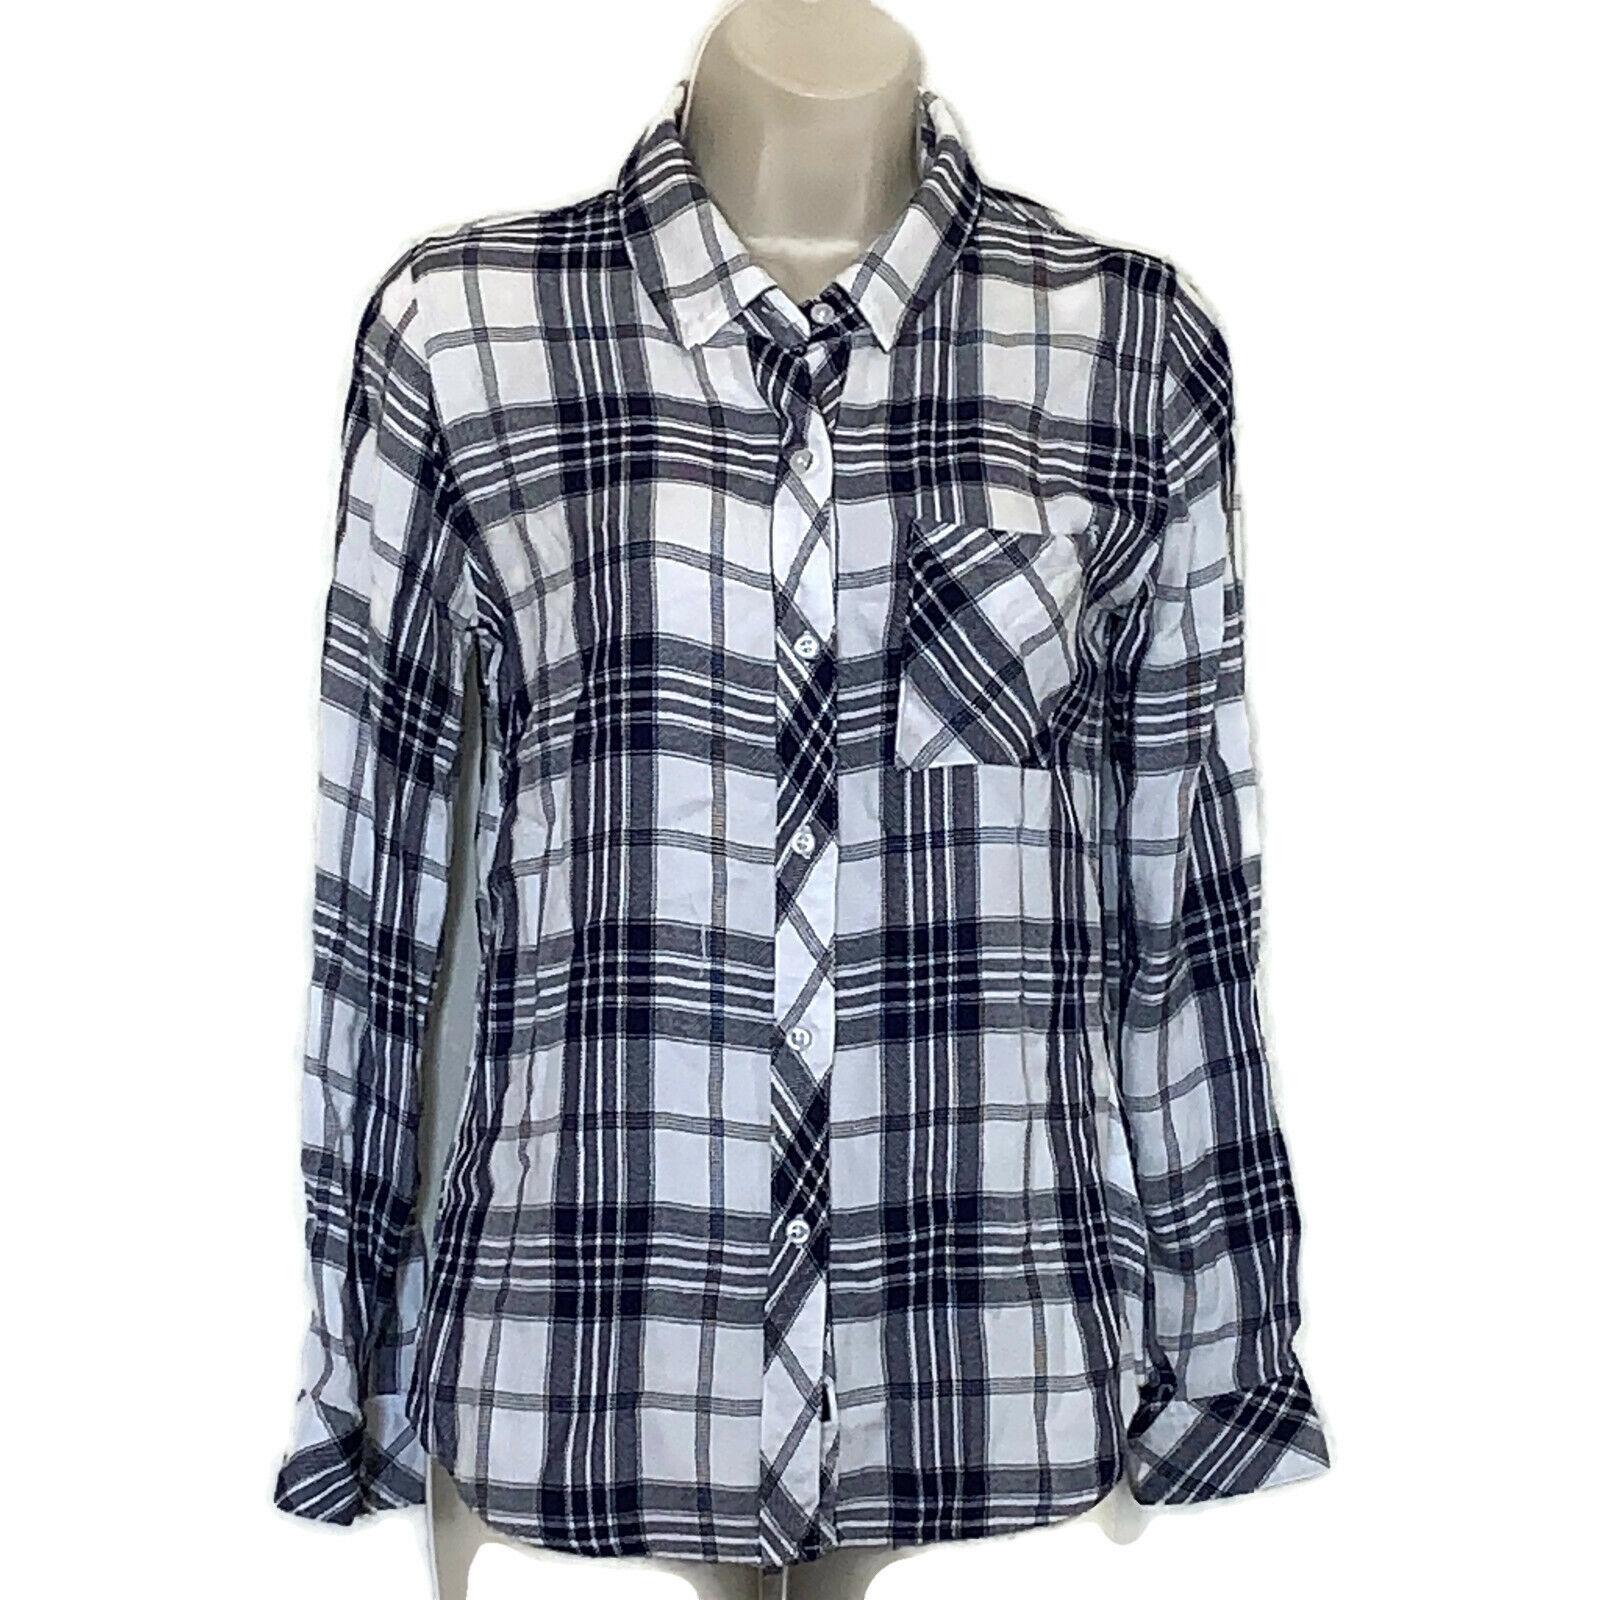 Rails Navy And White Super Soft Plaid Hunter Button Up Shirt Size XS